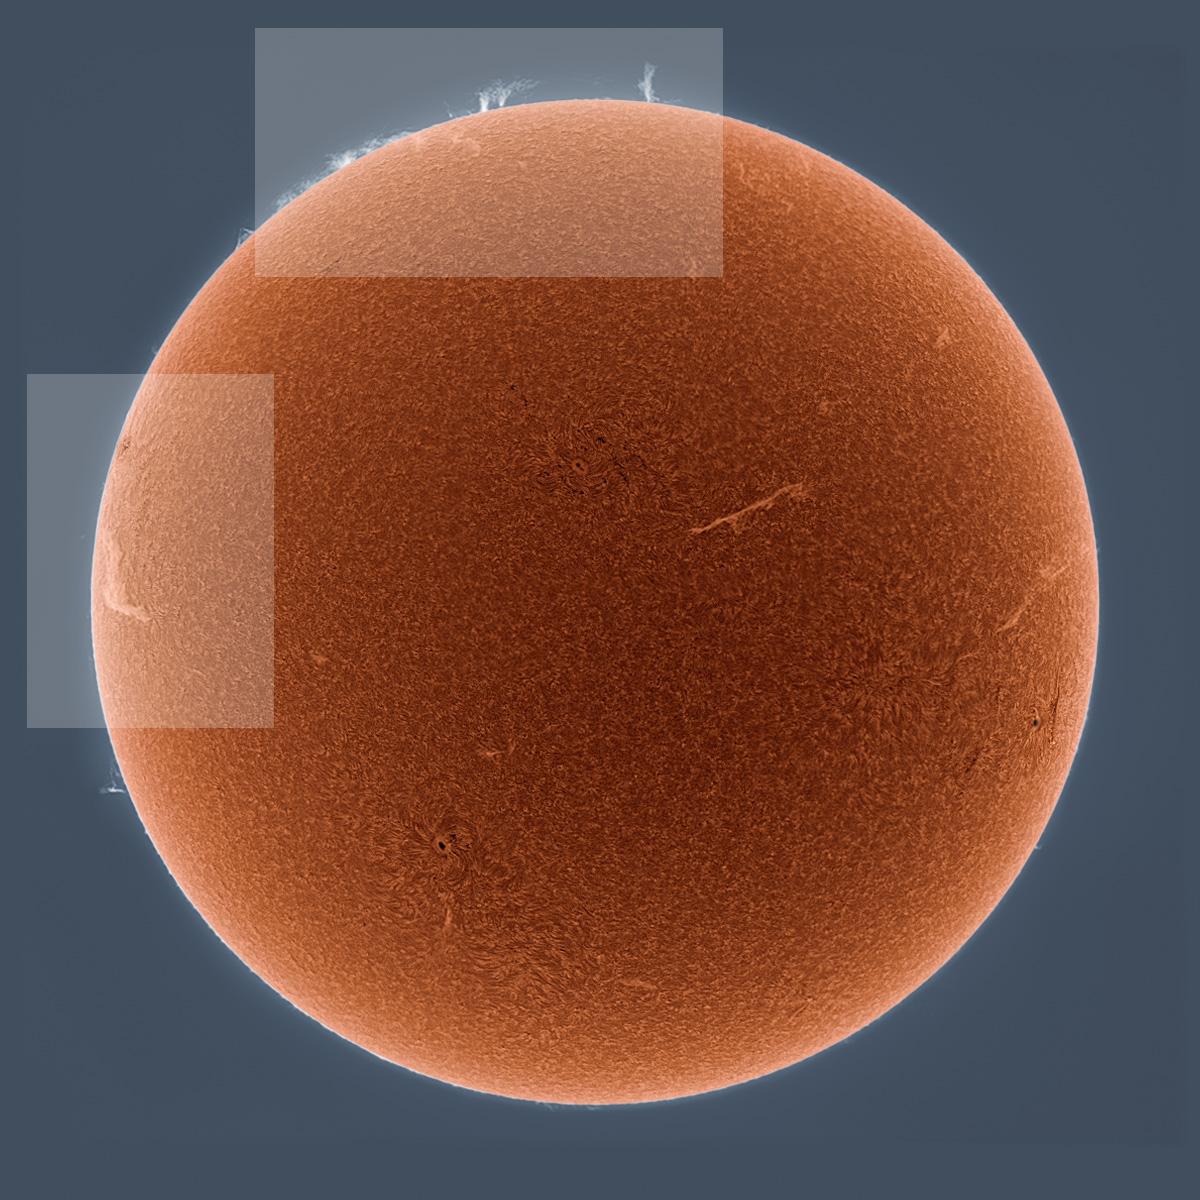 A portrait of the sun in the wavelength of hydrogen (Hα) alpha light. By Alan Friedman via @Kottke